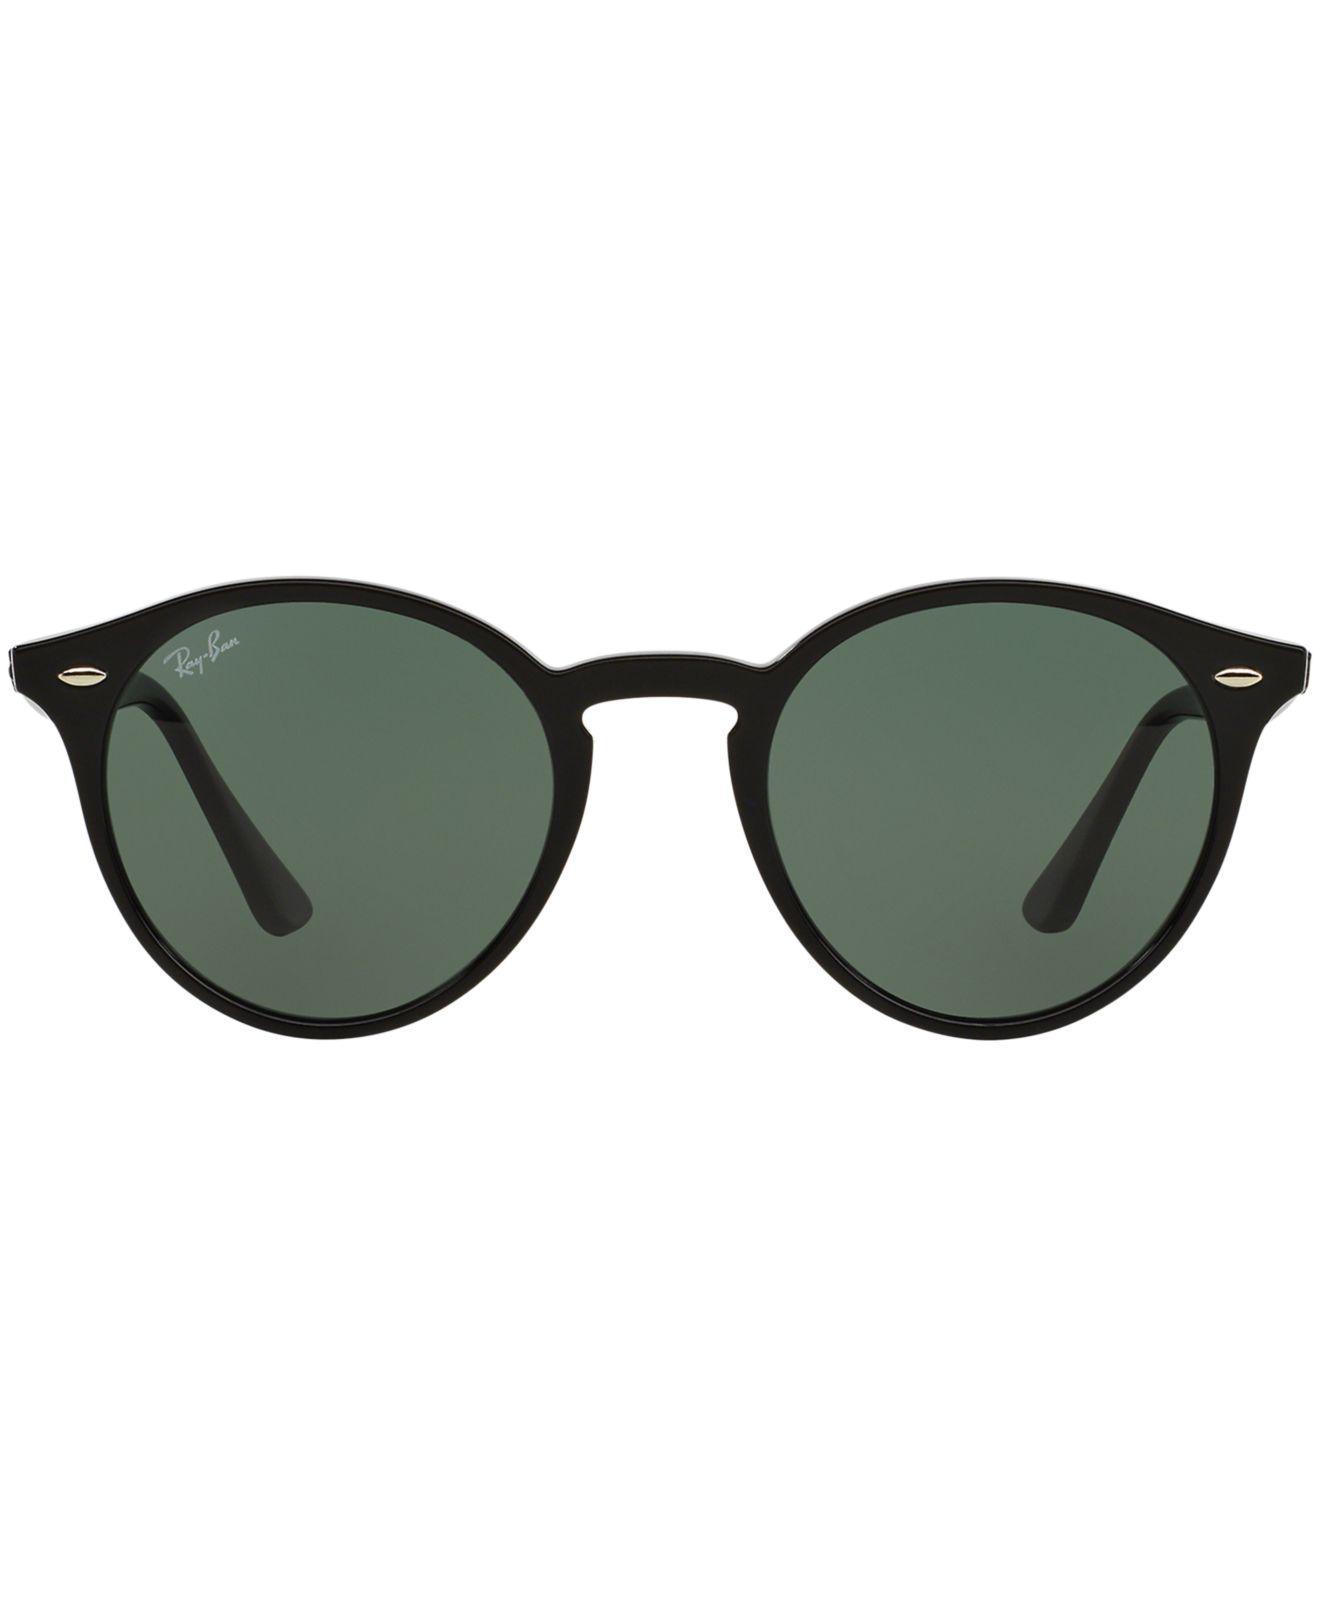 80941b1143c Lyst - Ray-Ban Sunglasses